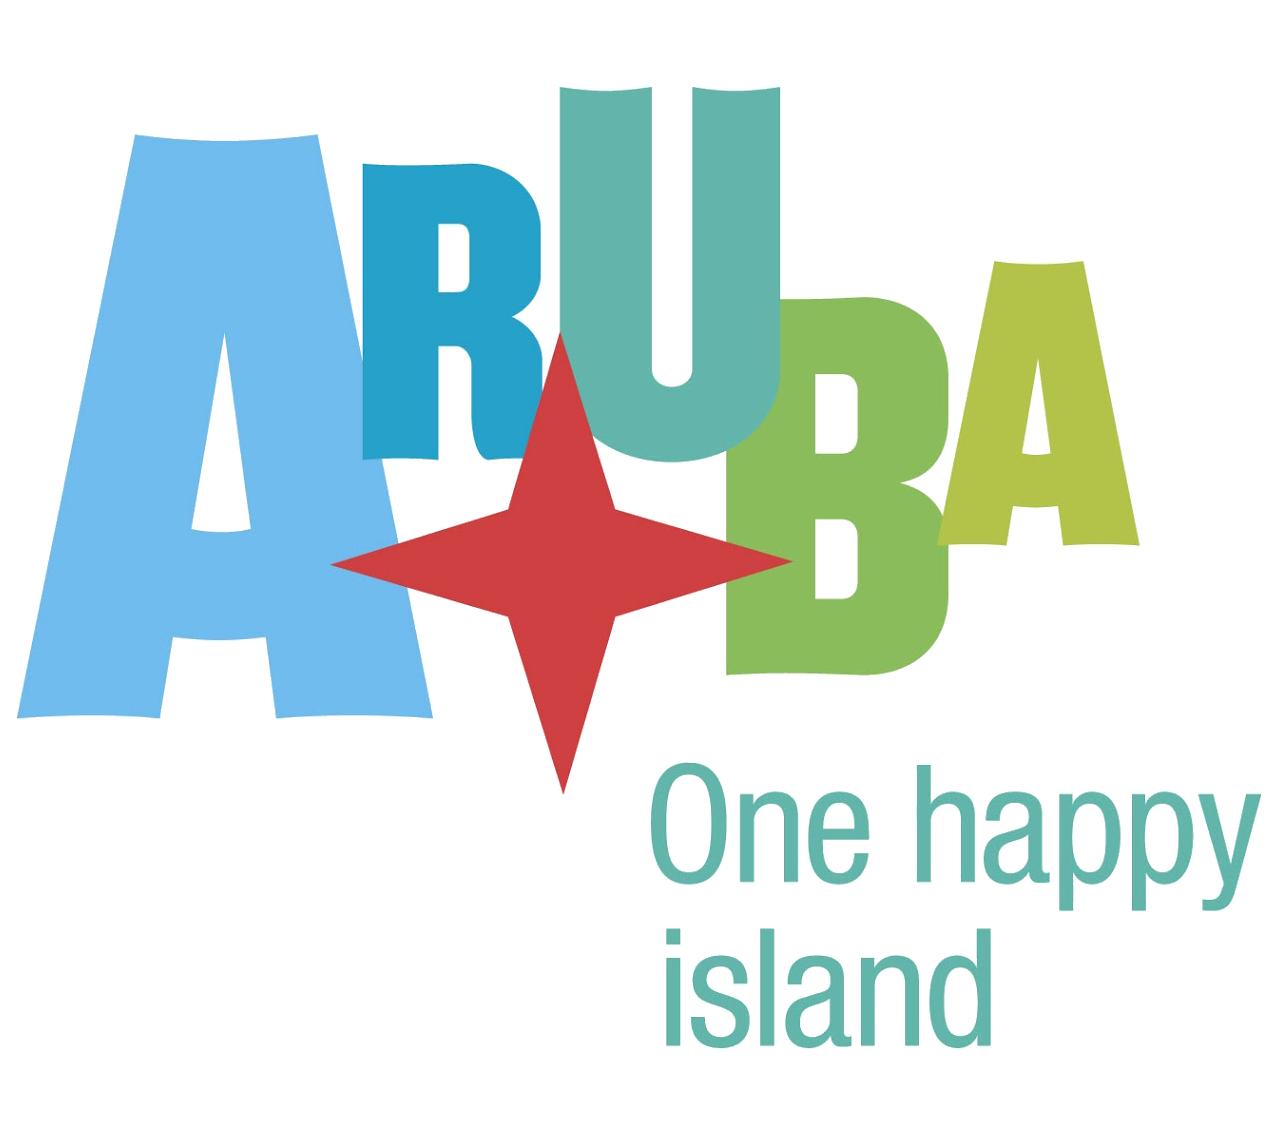 aruba one happy island.png